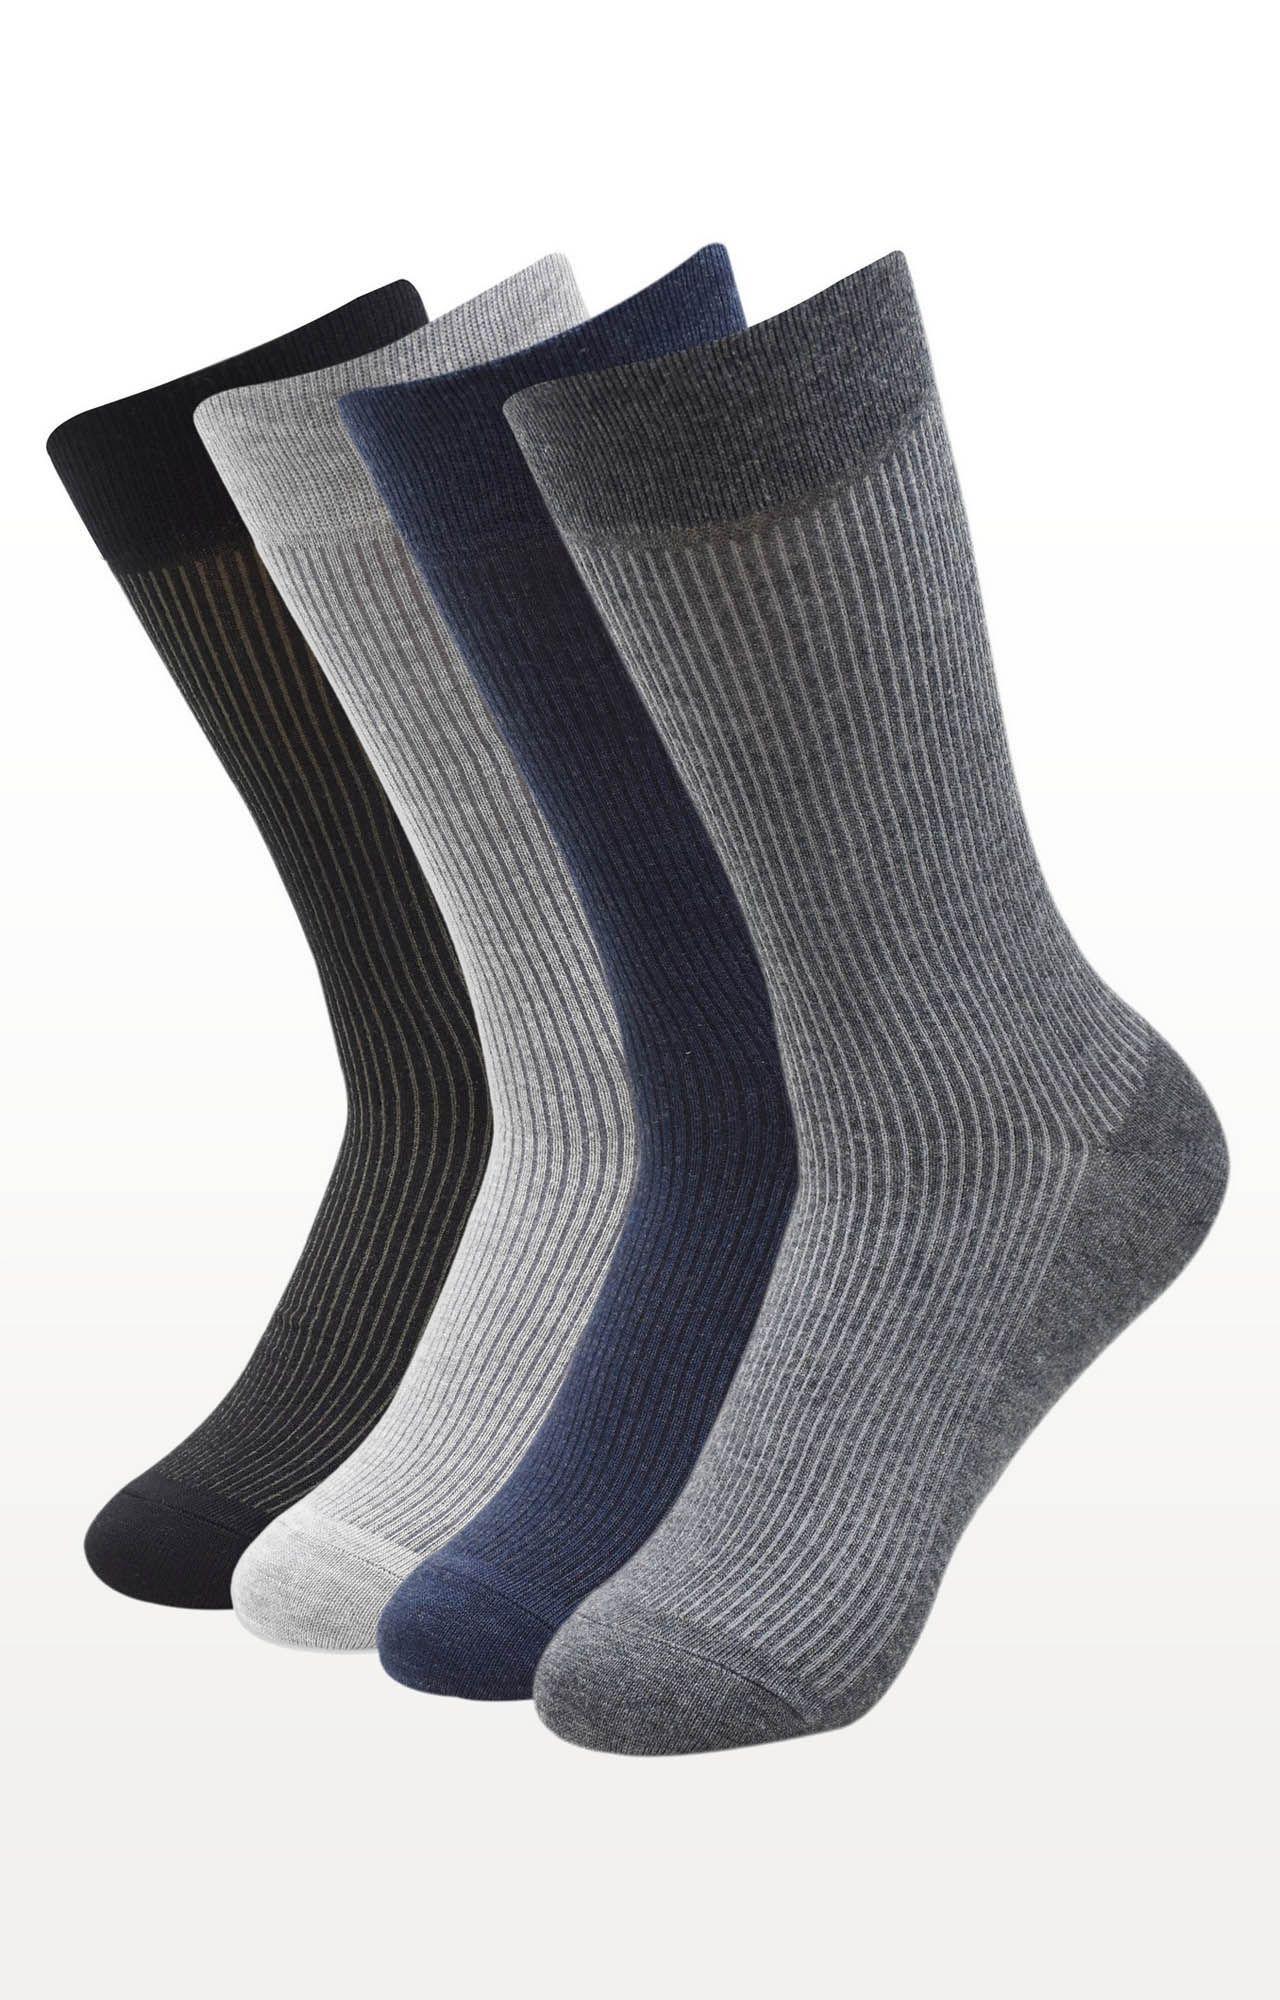 BALENZIA | Multicoloured Striped Socks - (Pack of 4)